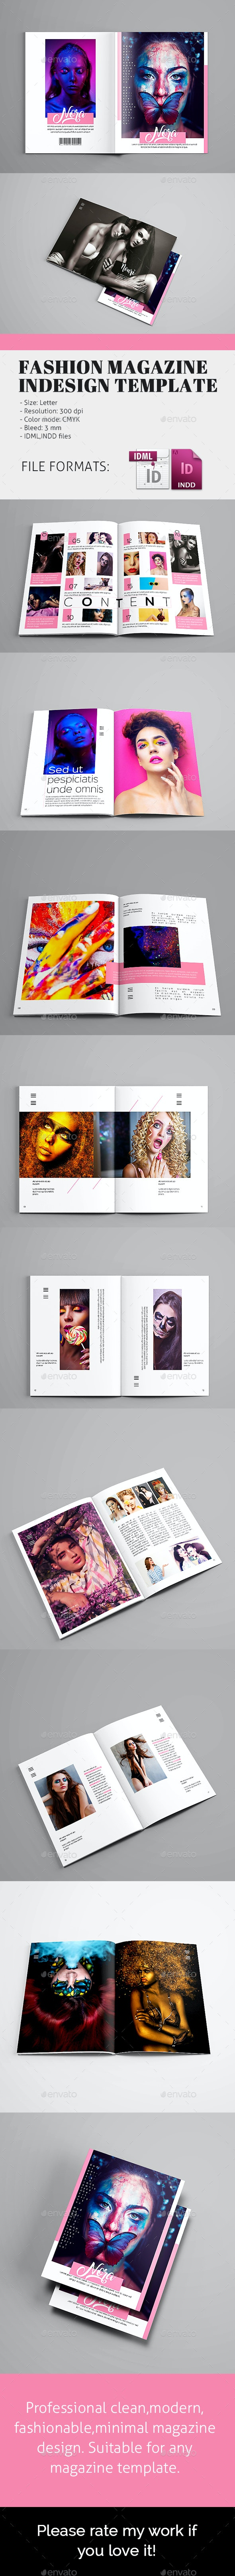 Fashion Magazine InDesign Template - Magazines Print Templates